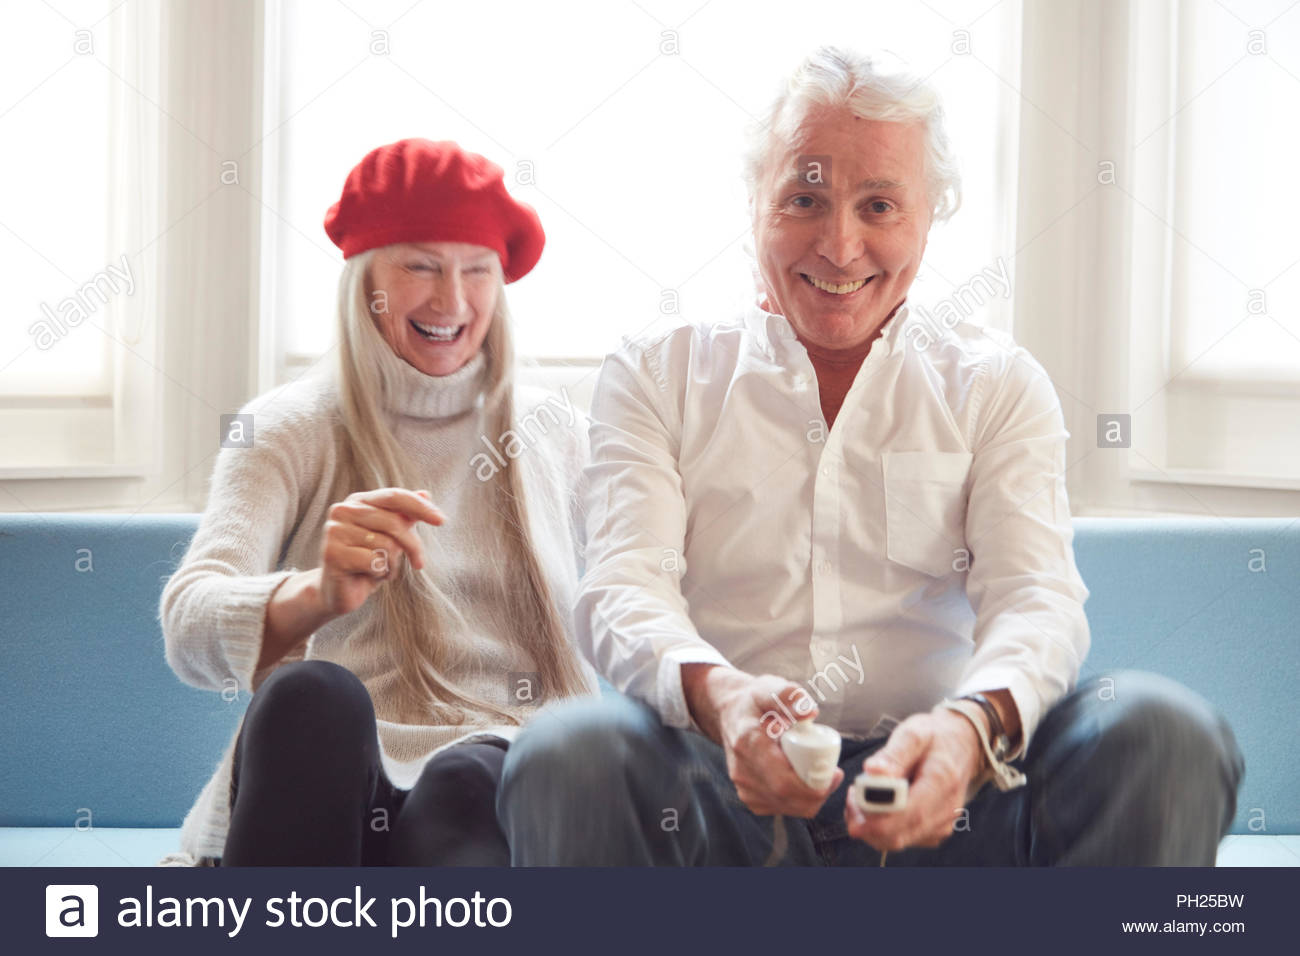 Senior couple playing video games - Stock Image